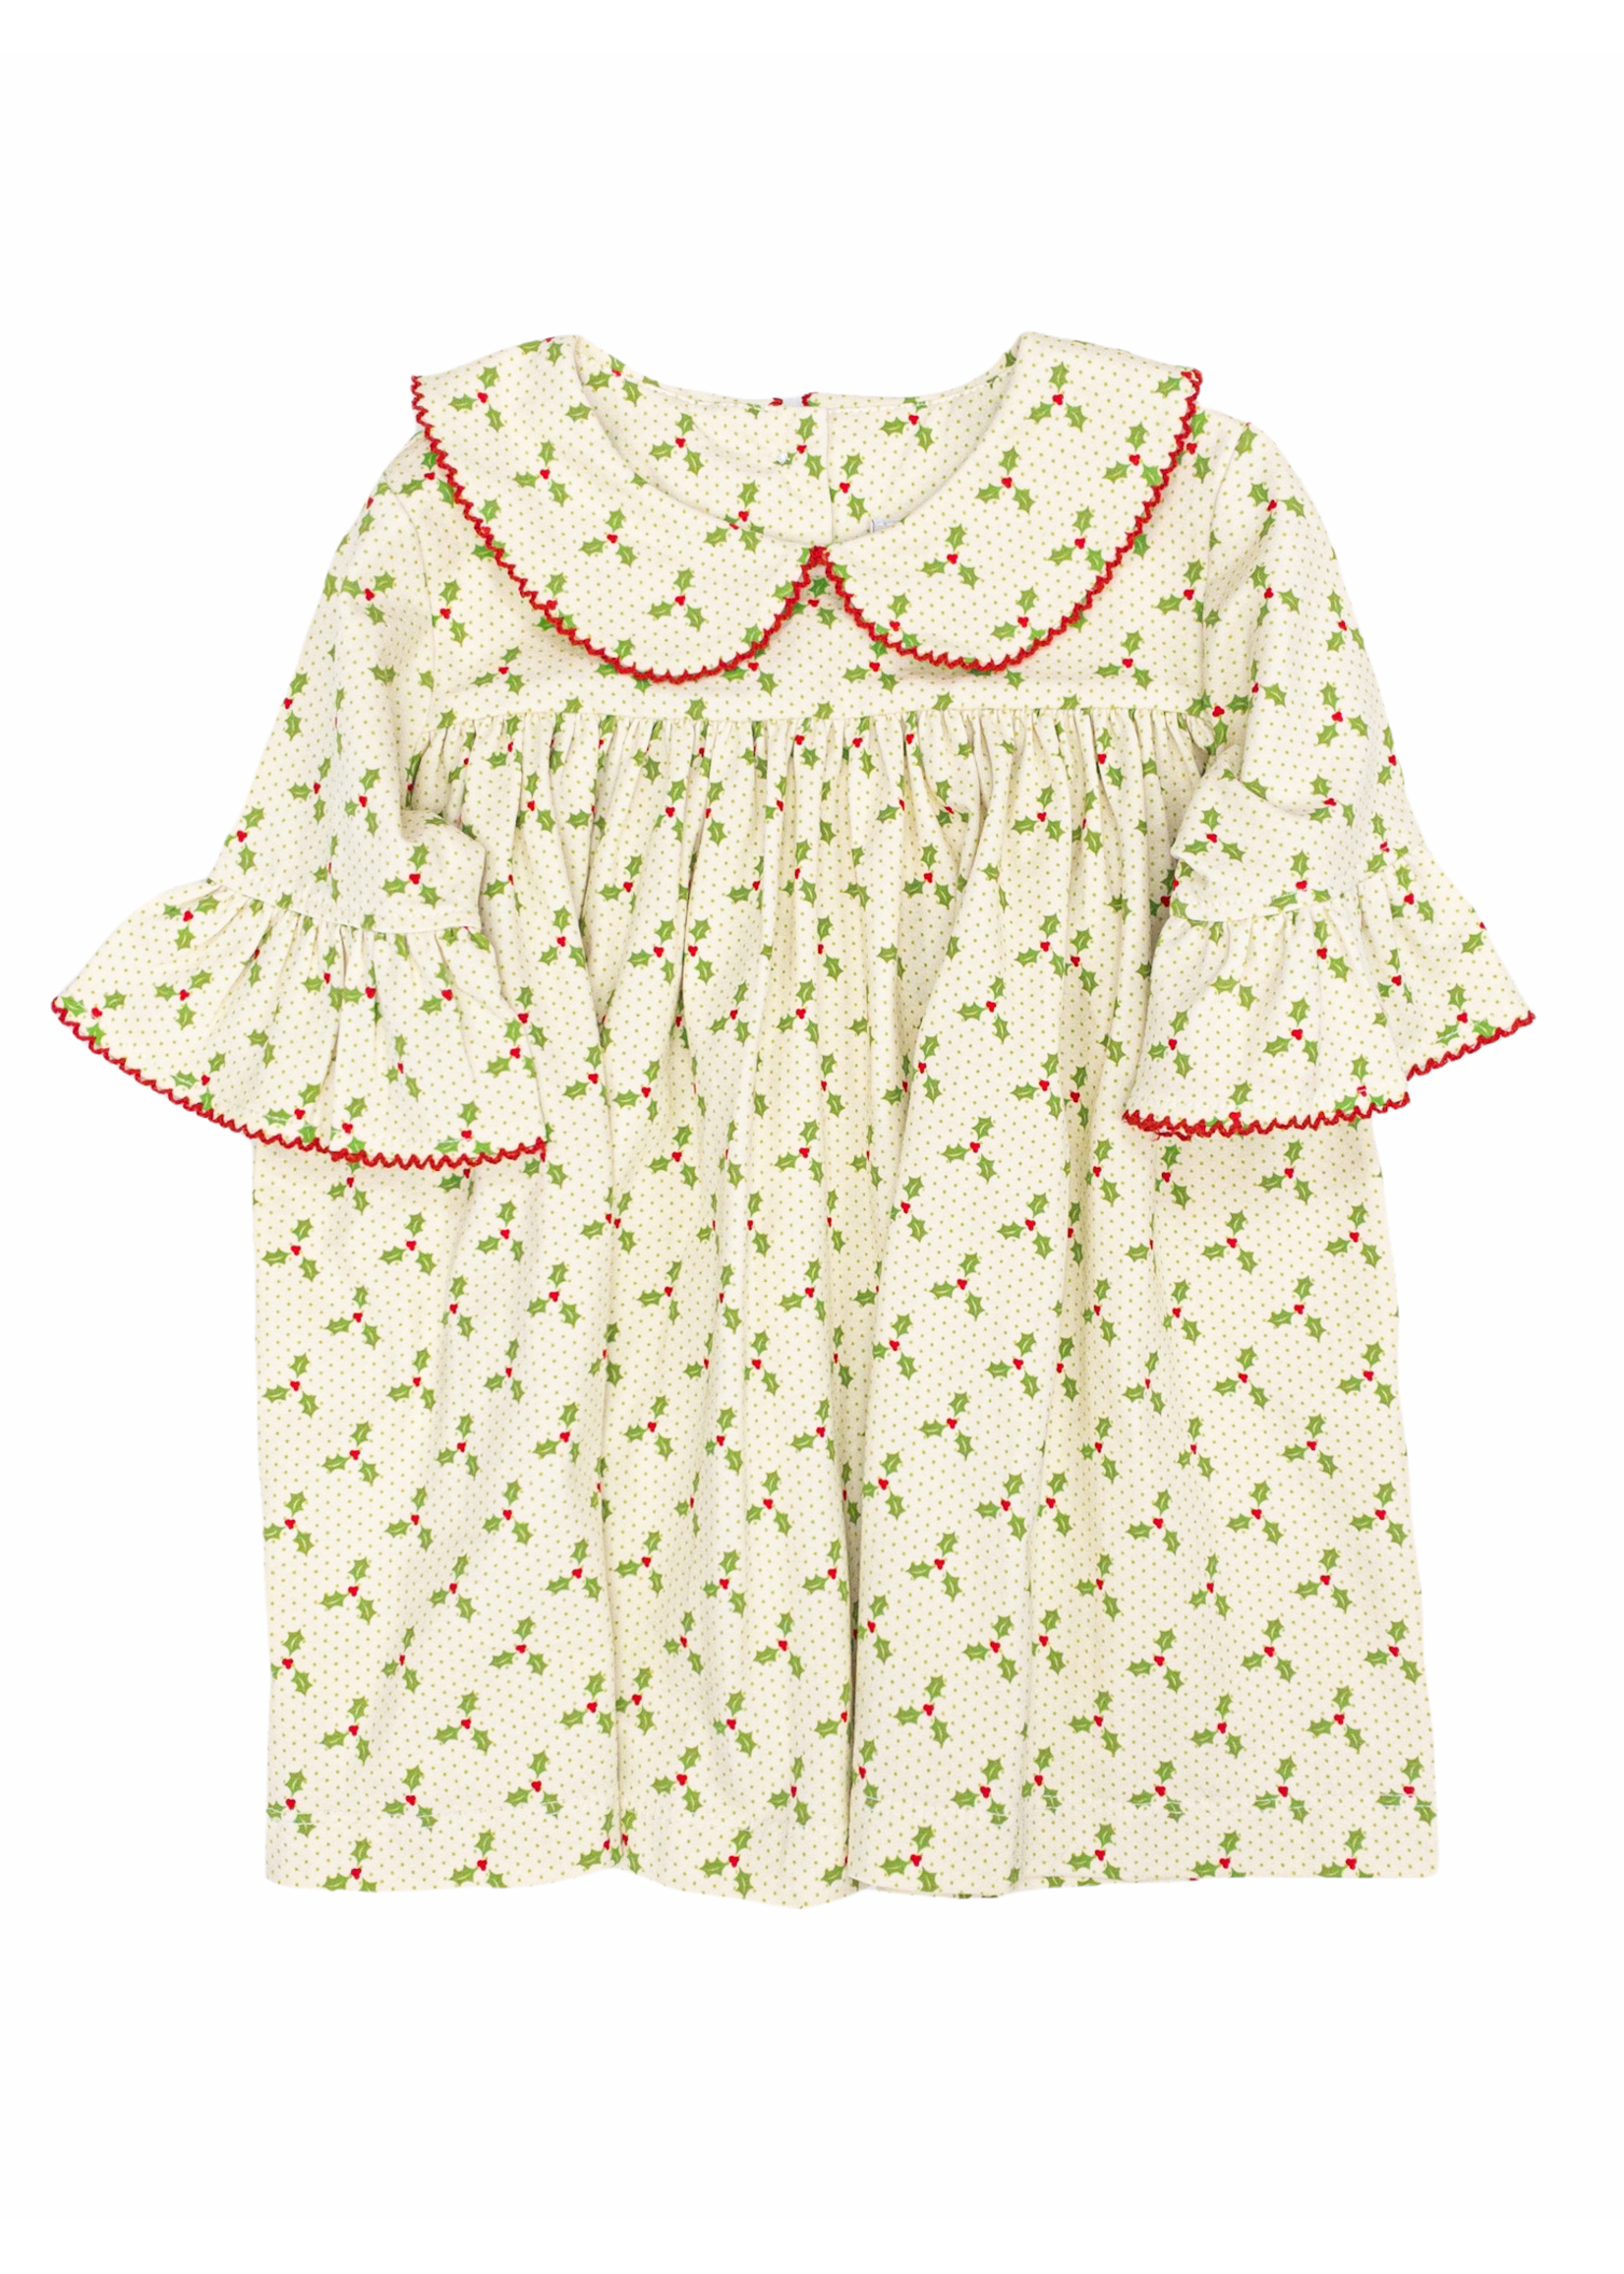 Delaney Girls Knit Holly Berry Dress W/ PP Collar Ruffle Sleeve